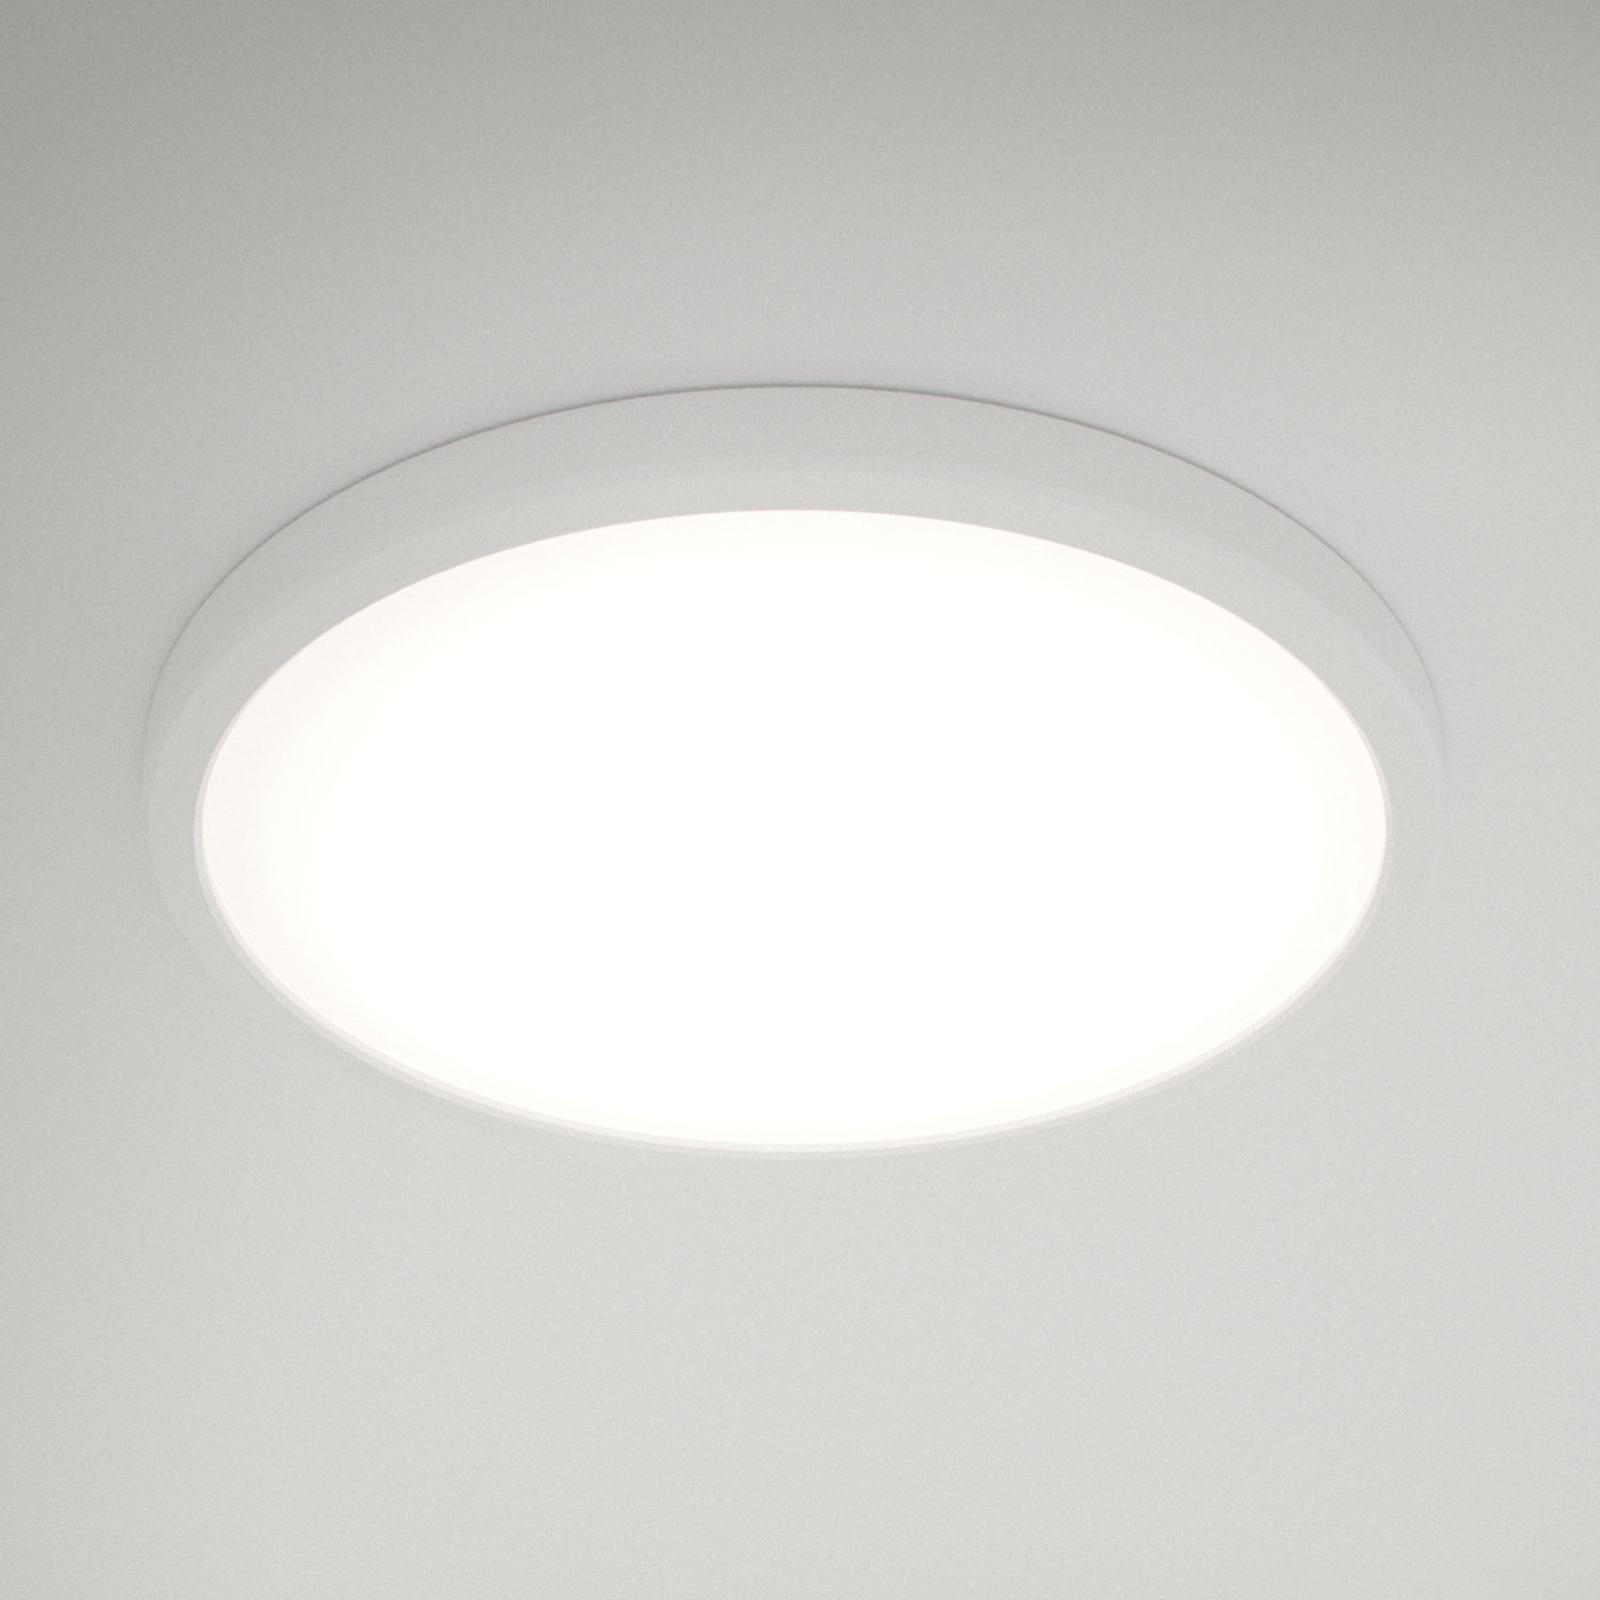 LED.taklampe Oja 29 IP54 2700 K